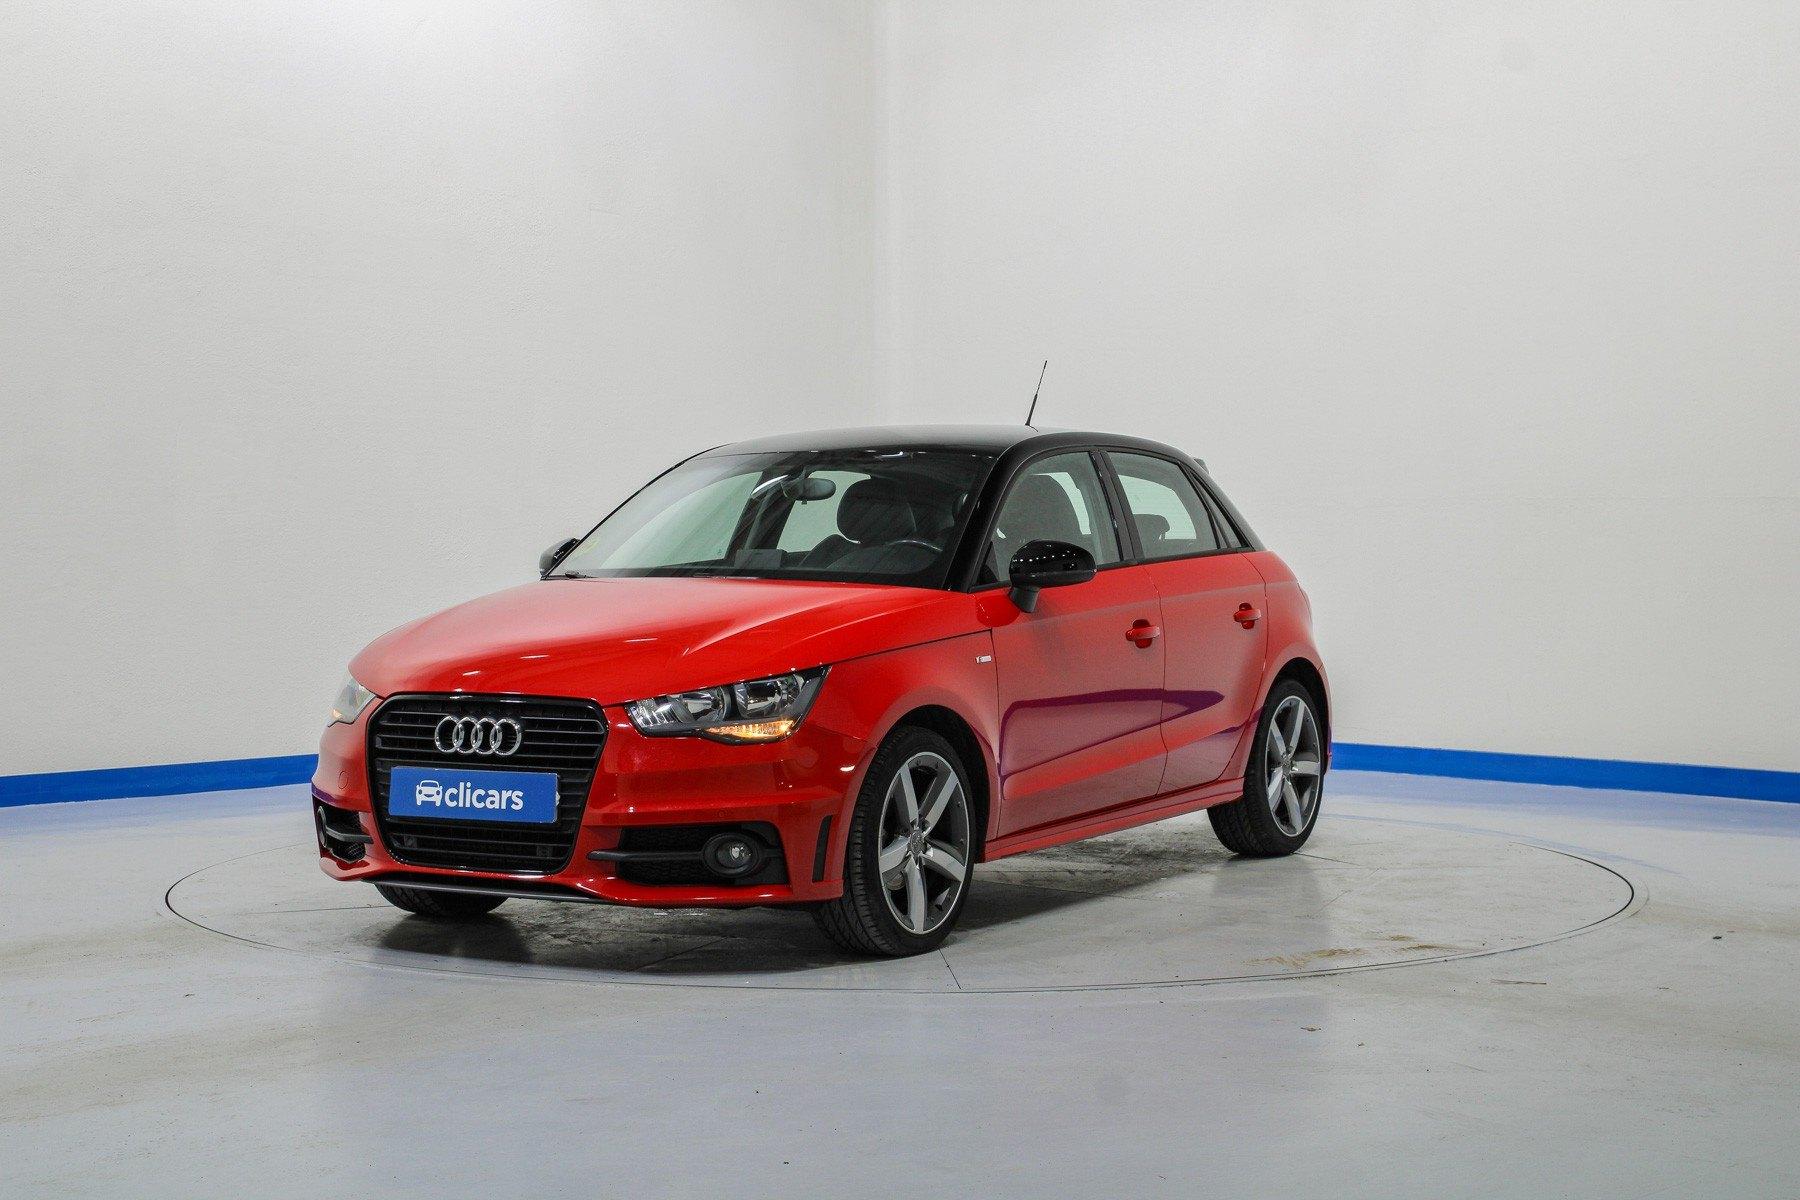 Audi A1 Diésel Sportback 1.6 TDI 90cv S tron Adrenalin2 1